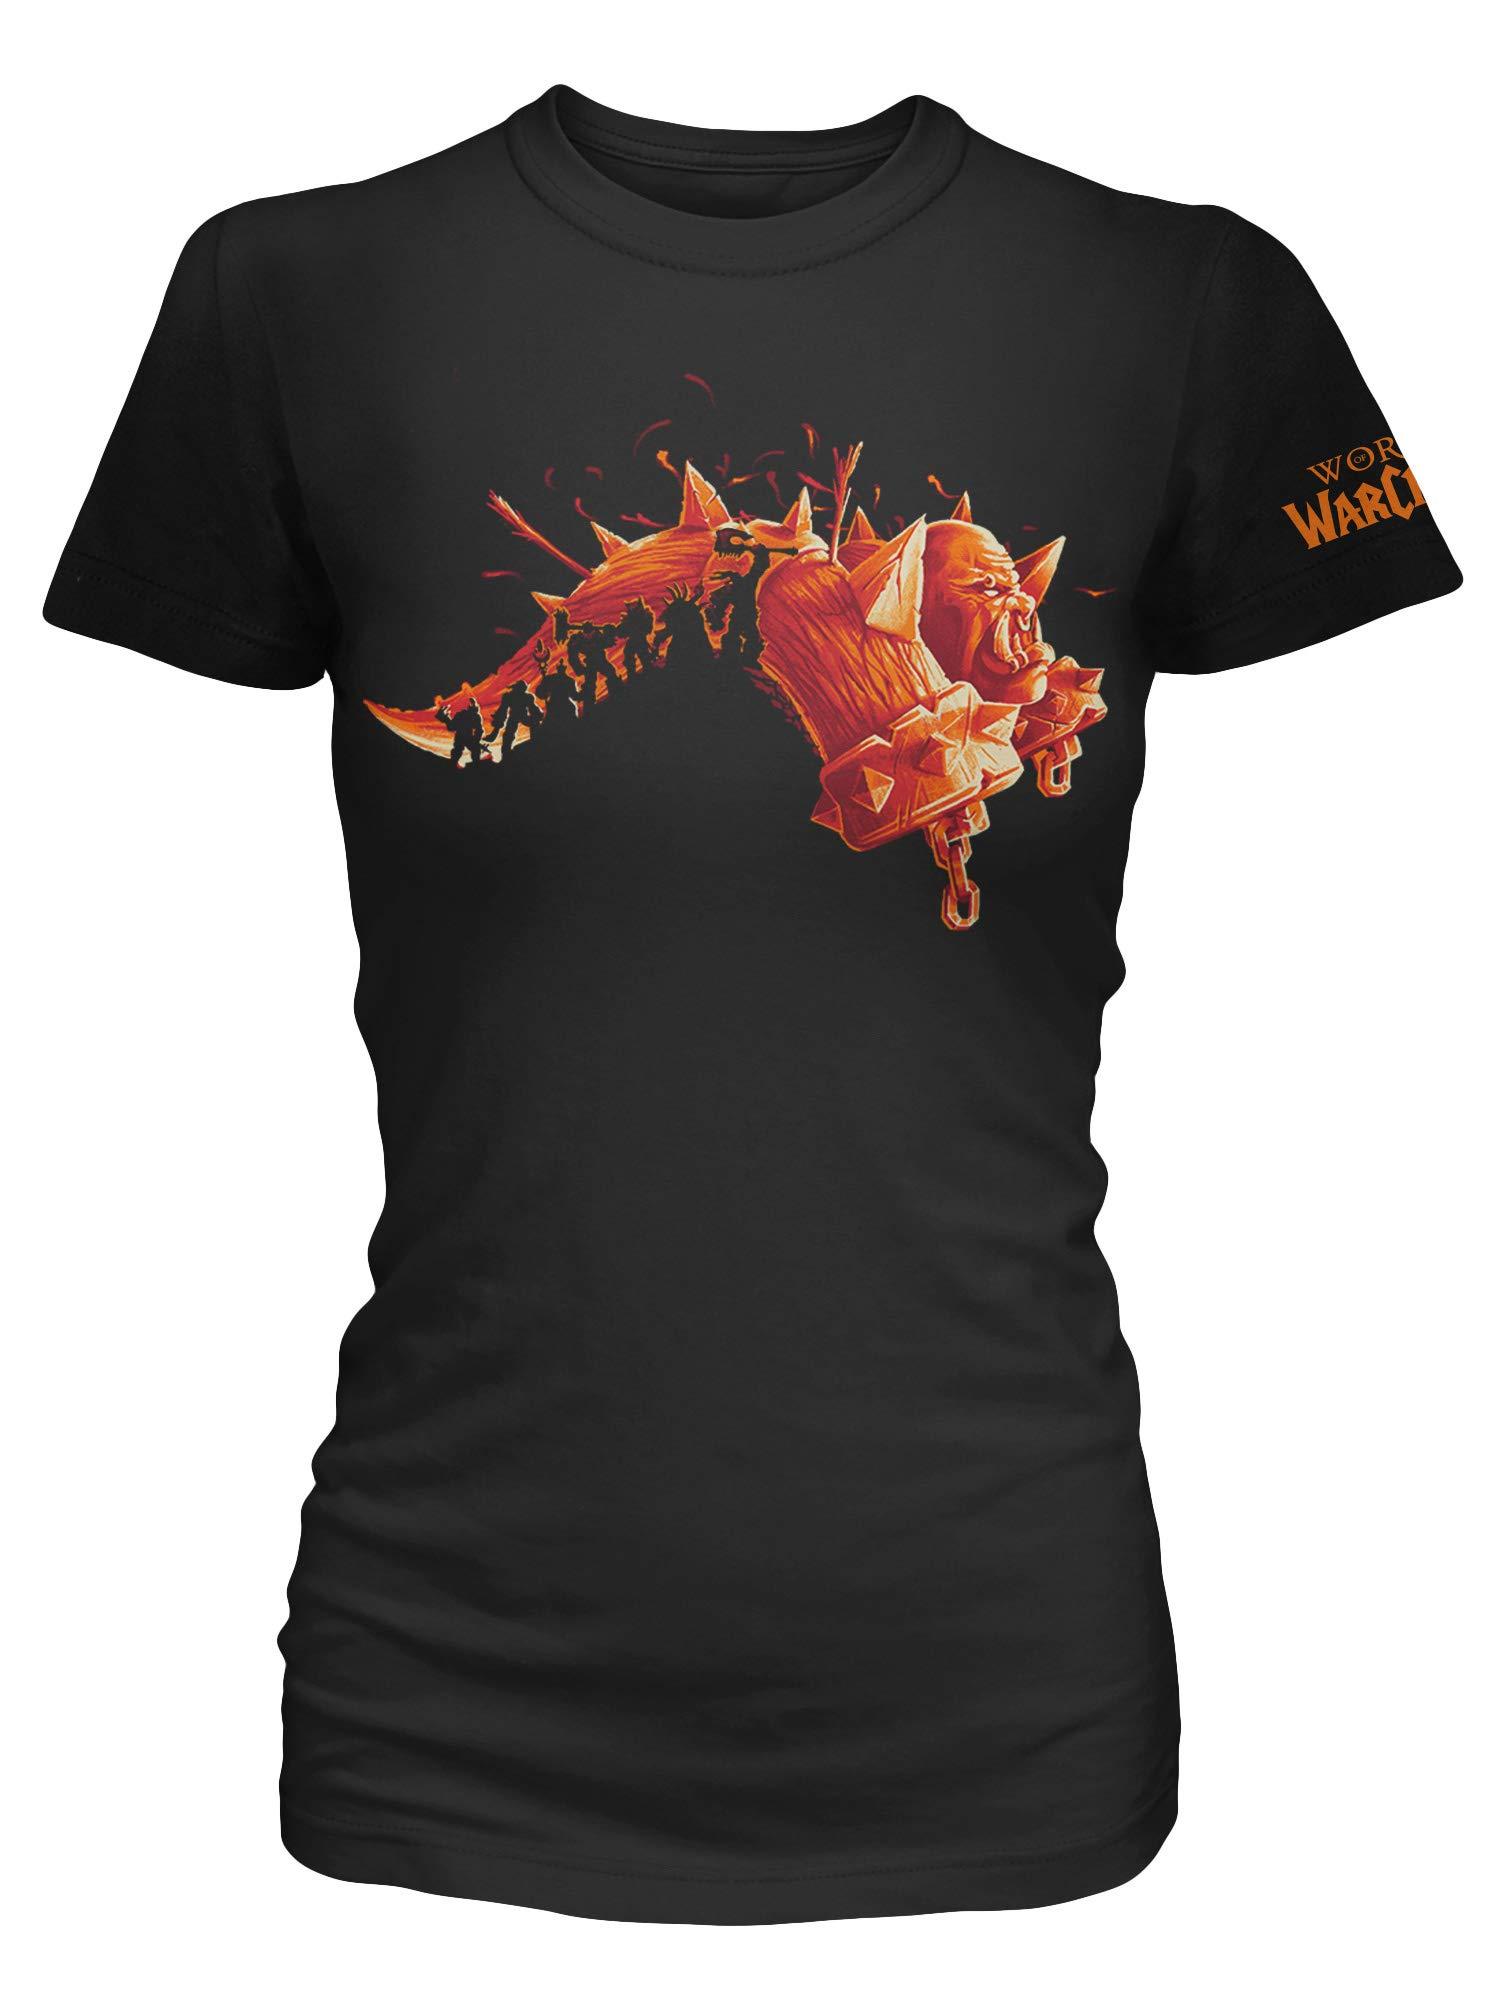 JINX World of Warcraft Warlords of Draenor (Expansion Series) Women's Gamer Tee Shirt